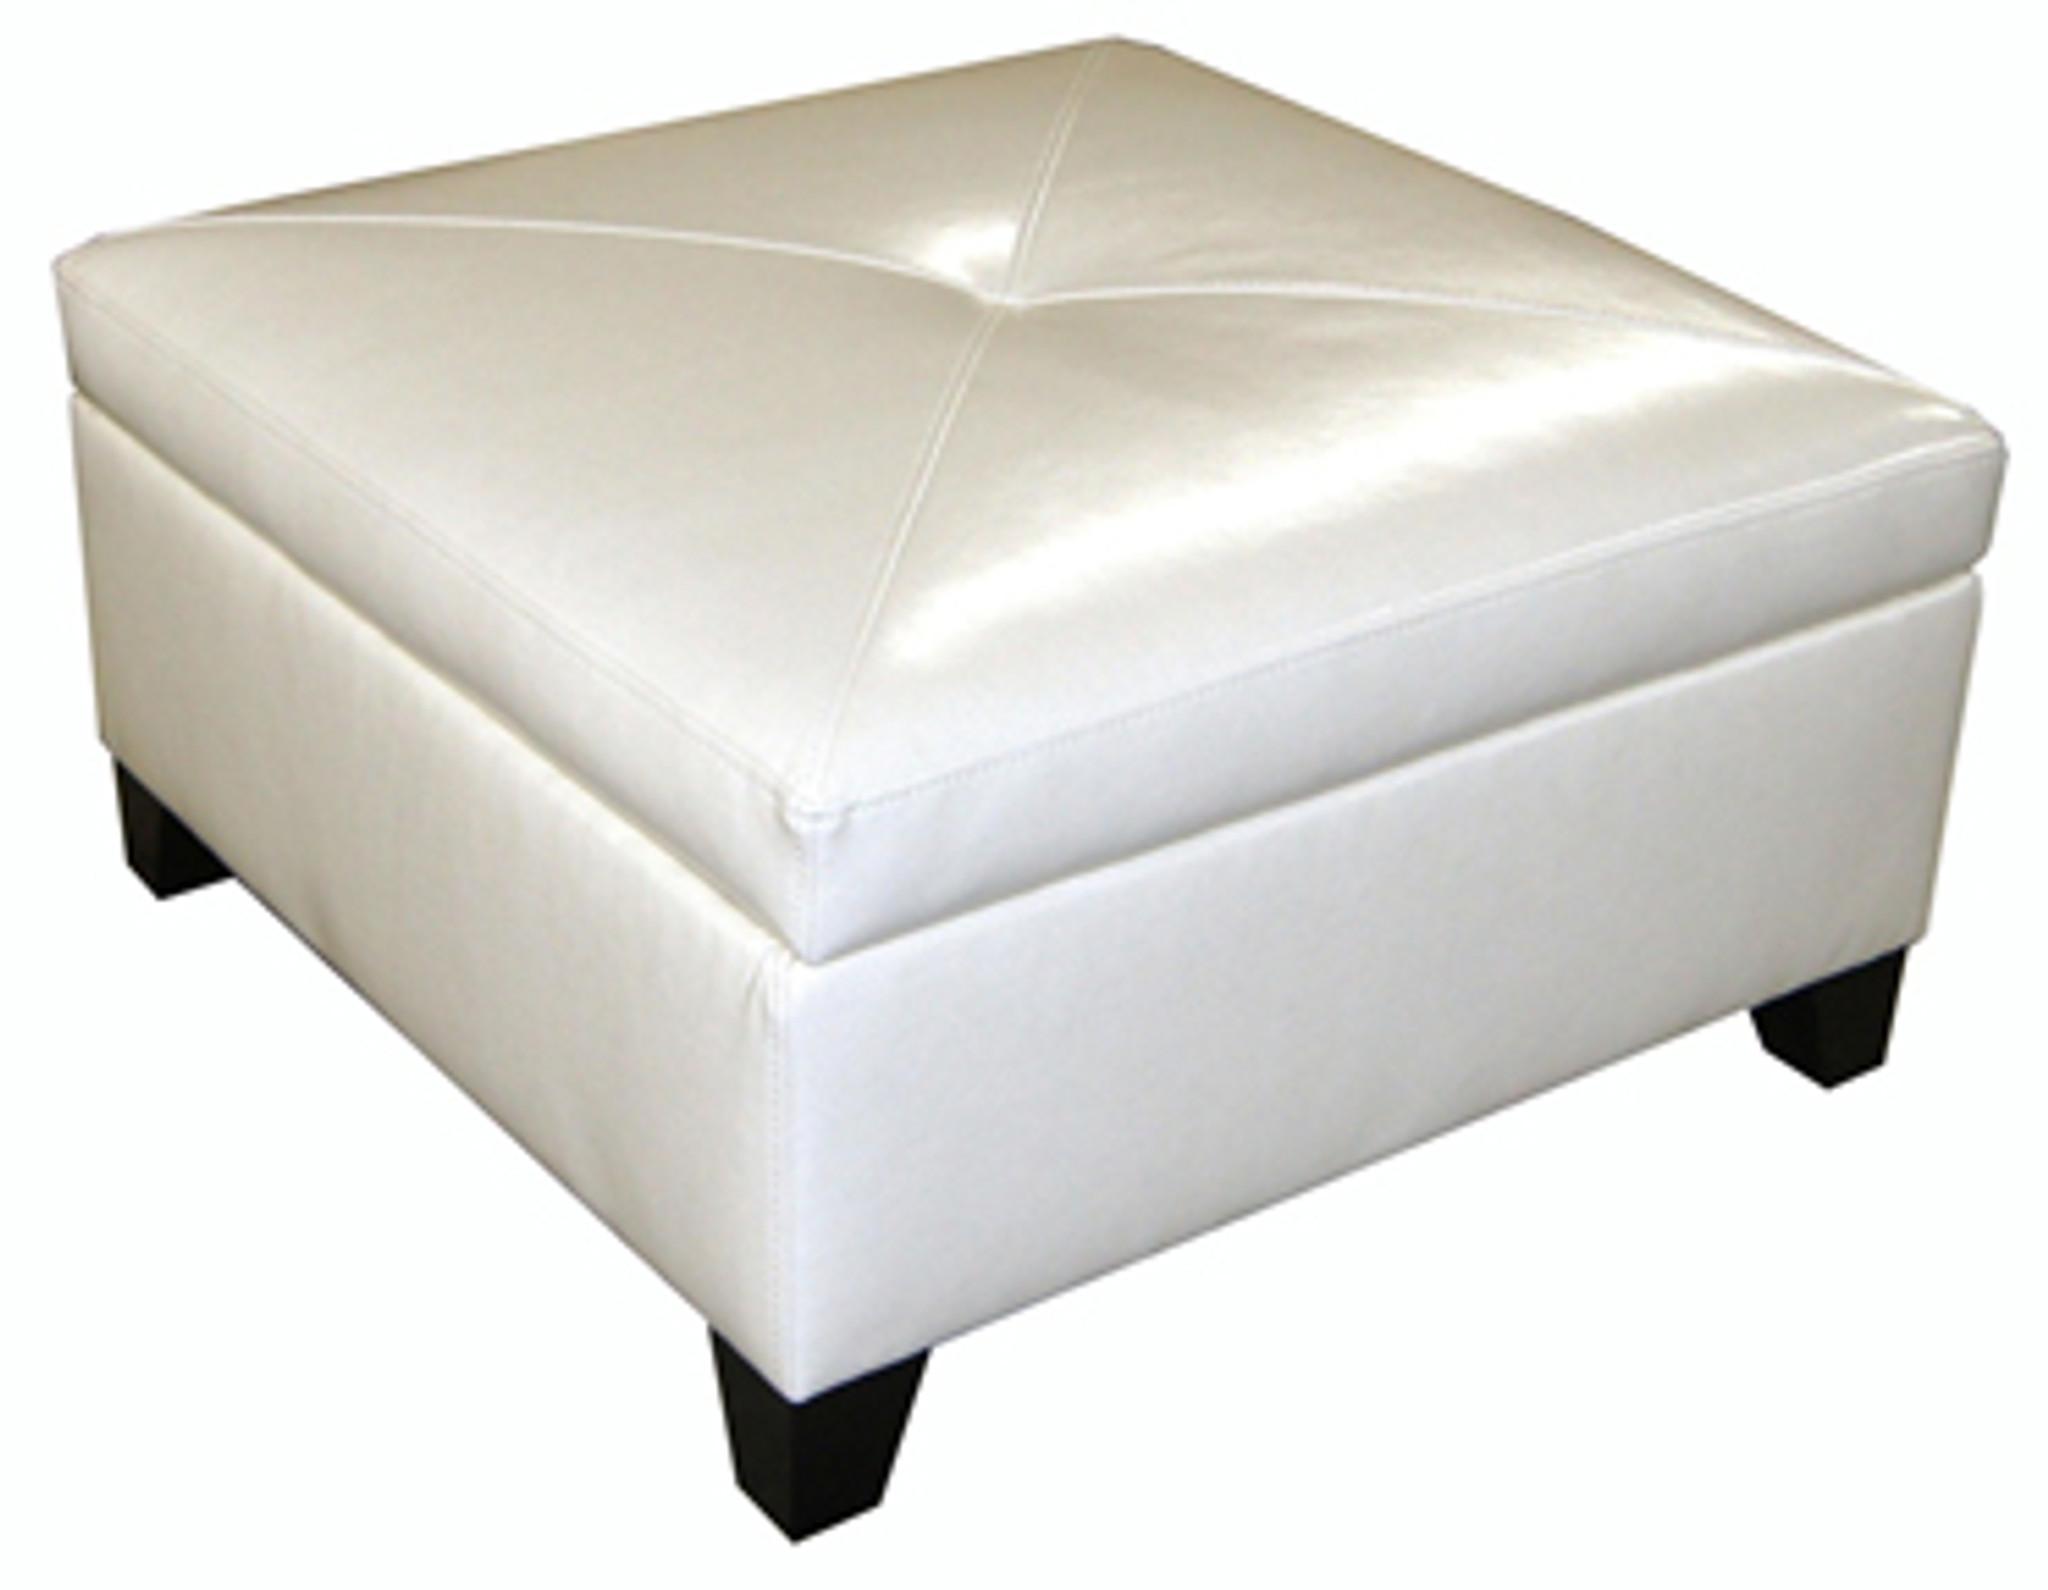 Incredible Leather Storage Ottoman Roys Furniture Chicago Designer Creativecarmelina Interior Chair Design Creativecarmelinacom